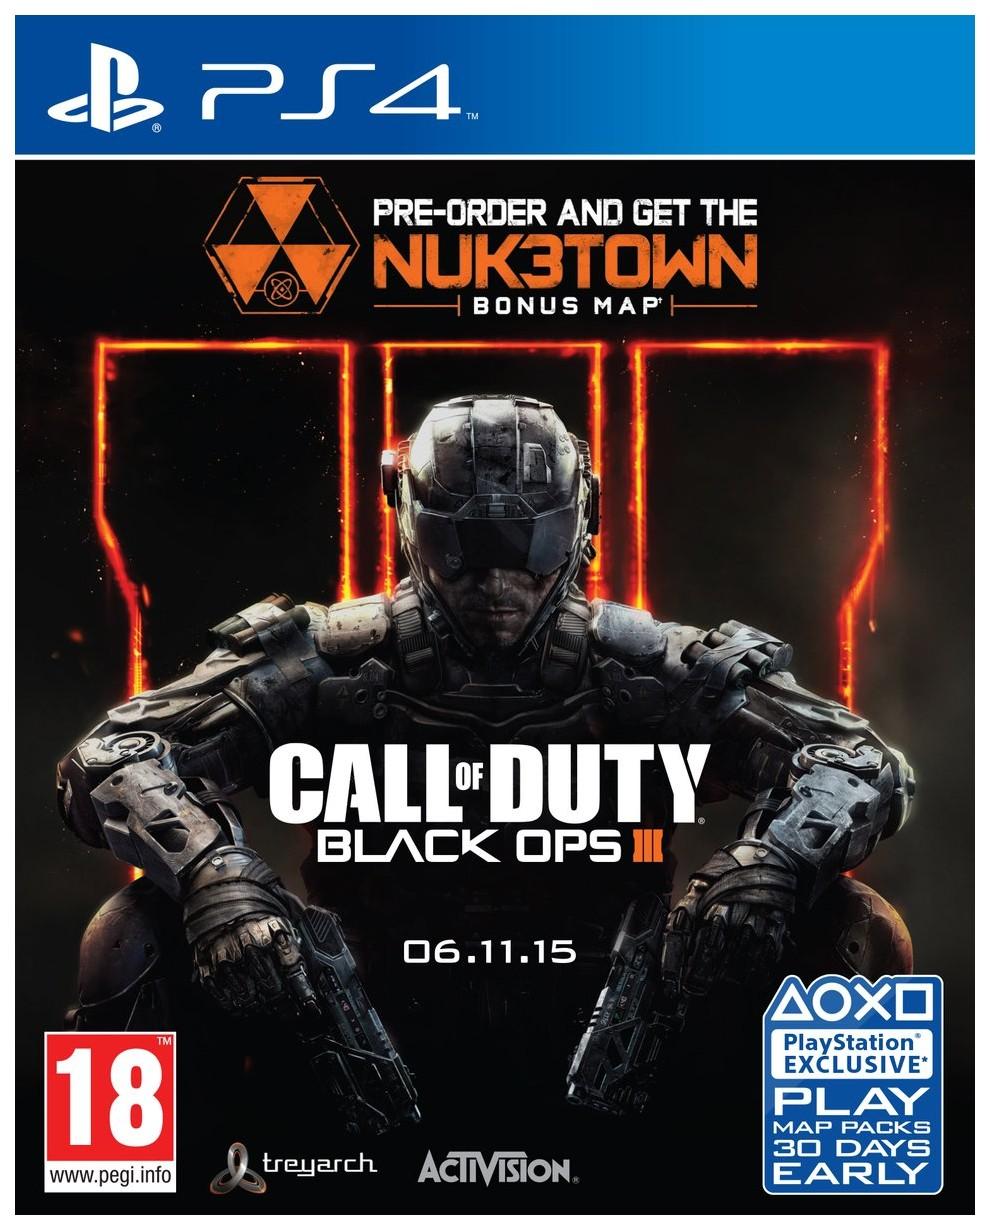 Игра Call of Duty Black Ops III Nuketown Edition для PlayStation 4